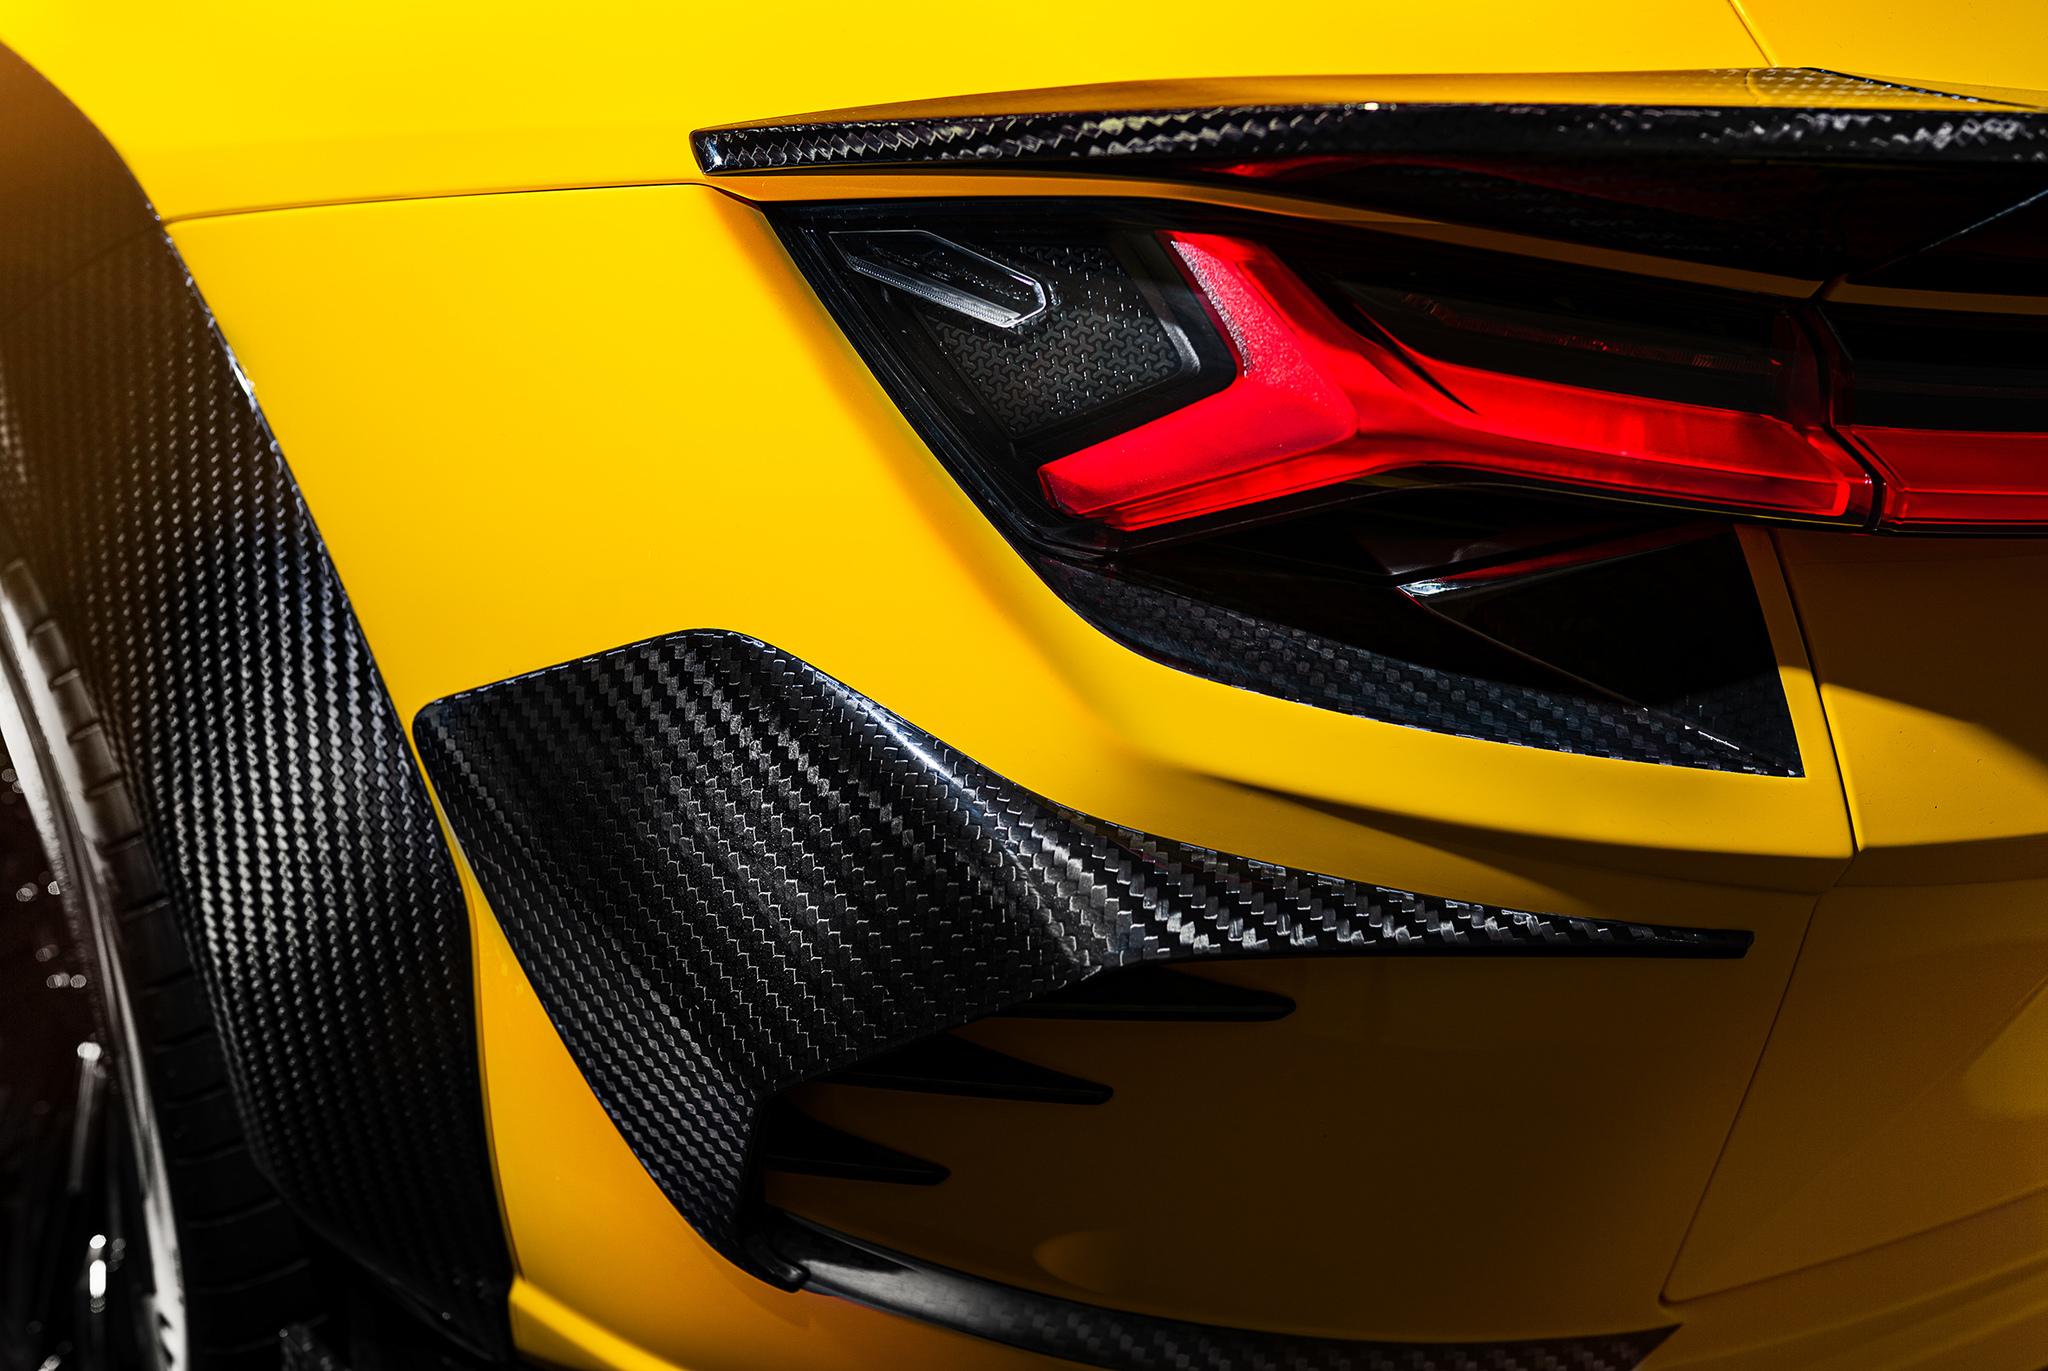 Keyvany body kit for Lamborghini Urus new model